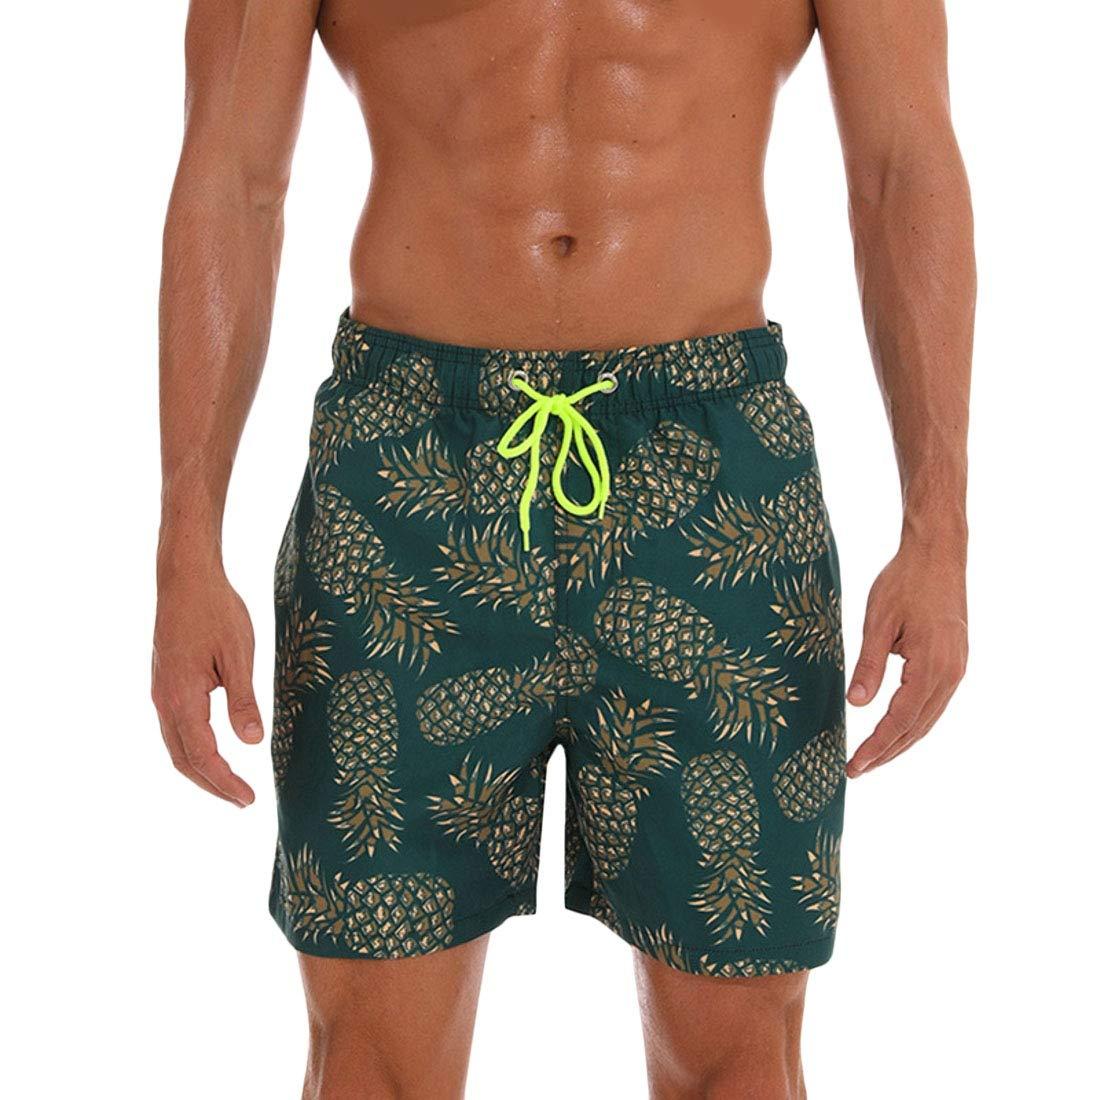 Mstyle Mens Quickly Drying Elastic Waist Floral Print Sport Flamingo Summer Beach Shorts Boardshort Swim Trunk